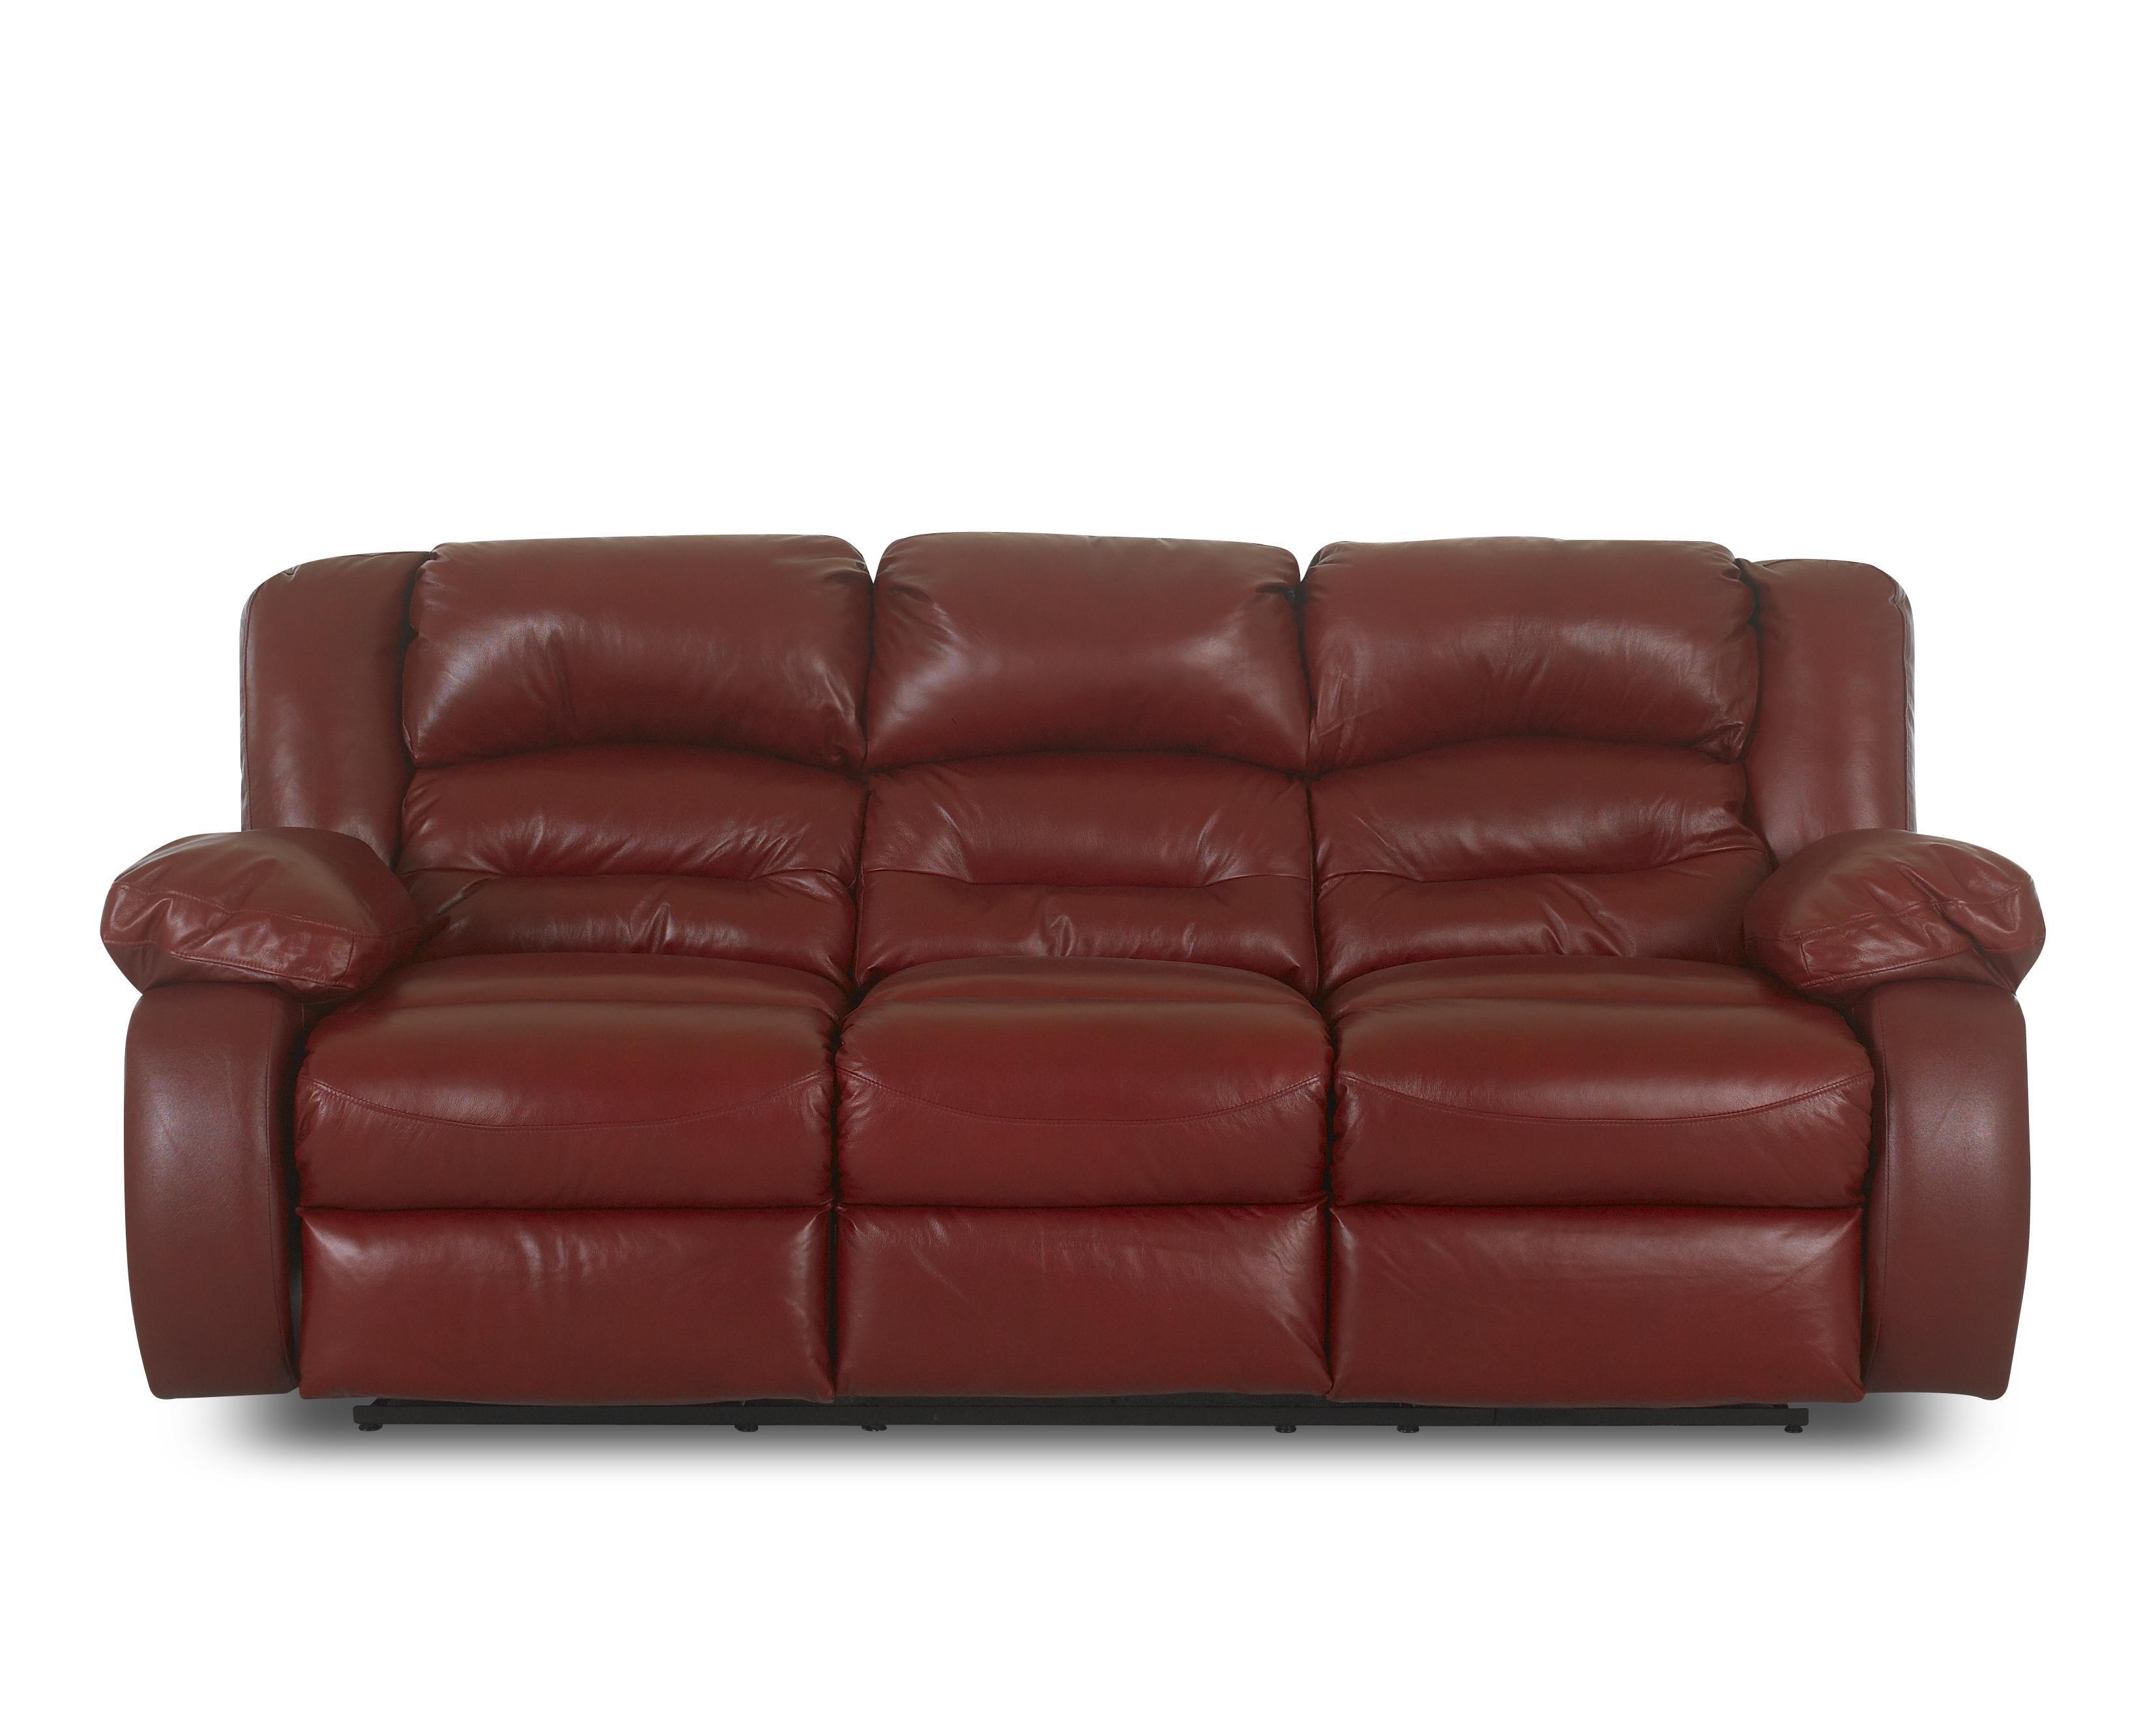 Klaussner Austin Casual Reclining Sofa - Item Number: L33505TRS